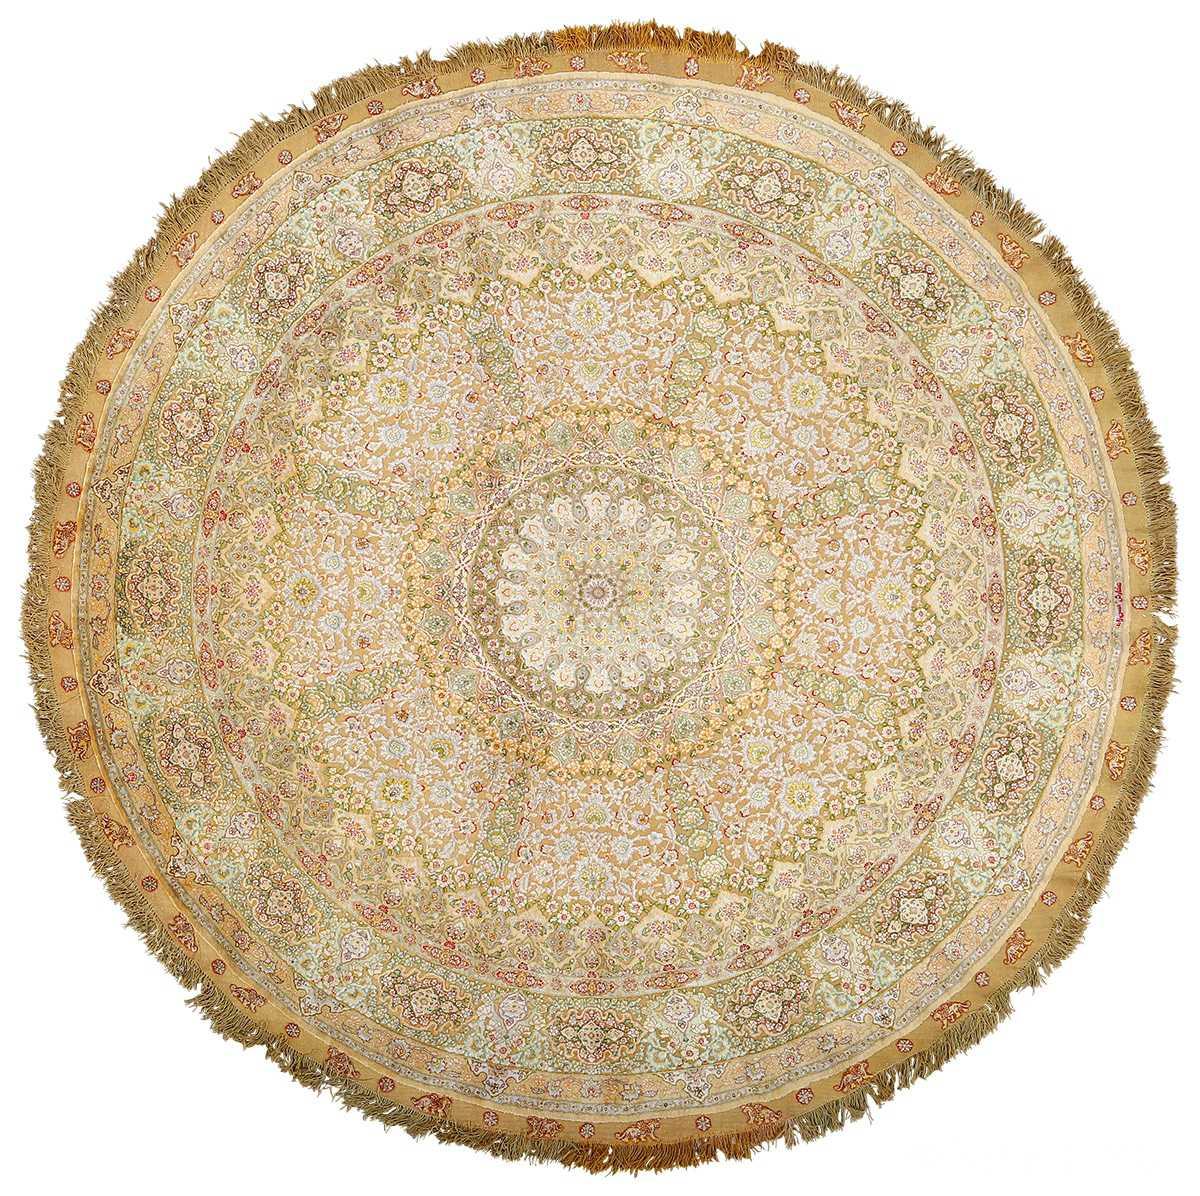 Modern Persian Tabriz Design Rug 44687 Nazmiyal Antique Rugs: Silk Gold Metallic Threading Tabriz Persian Rug 51006 Nazmiyal